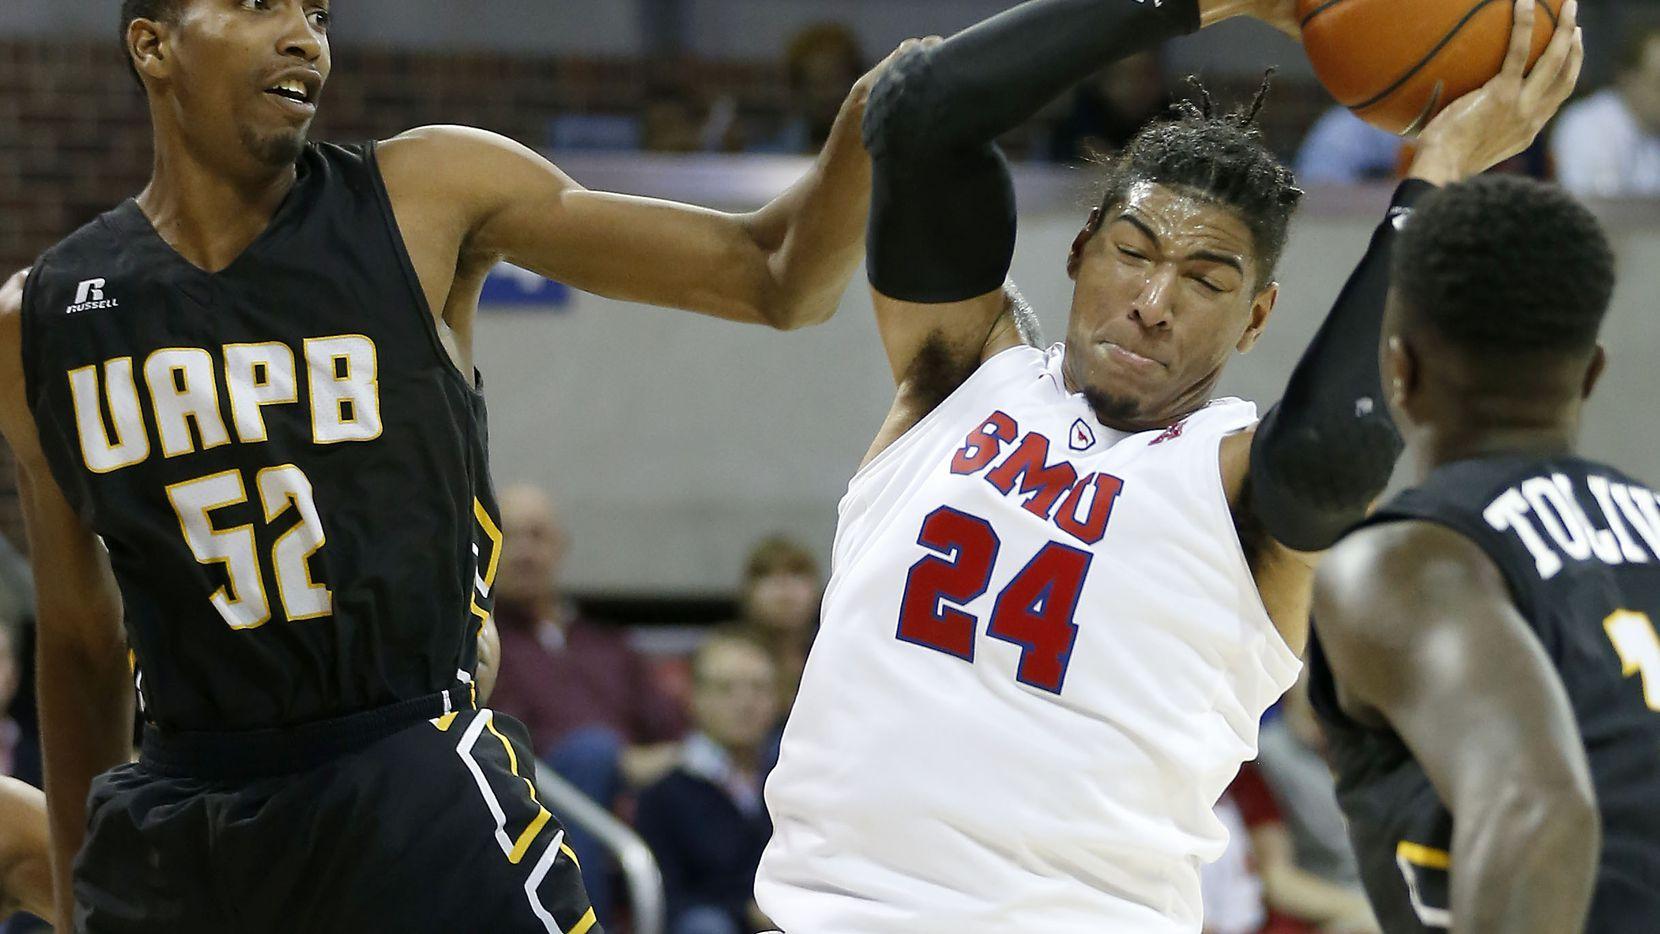 FILE - SMU forward Everett Ray (24) gets a rebound against Arkansas-Pine Bluff center David Tillman (52) during the first half at Moody Coliseum in Dallas, Saturday, Nov. 18, 2017. (Jae S. Lee/The Dallas Morning News)